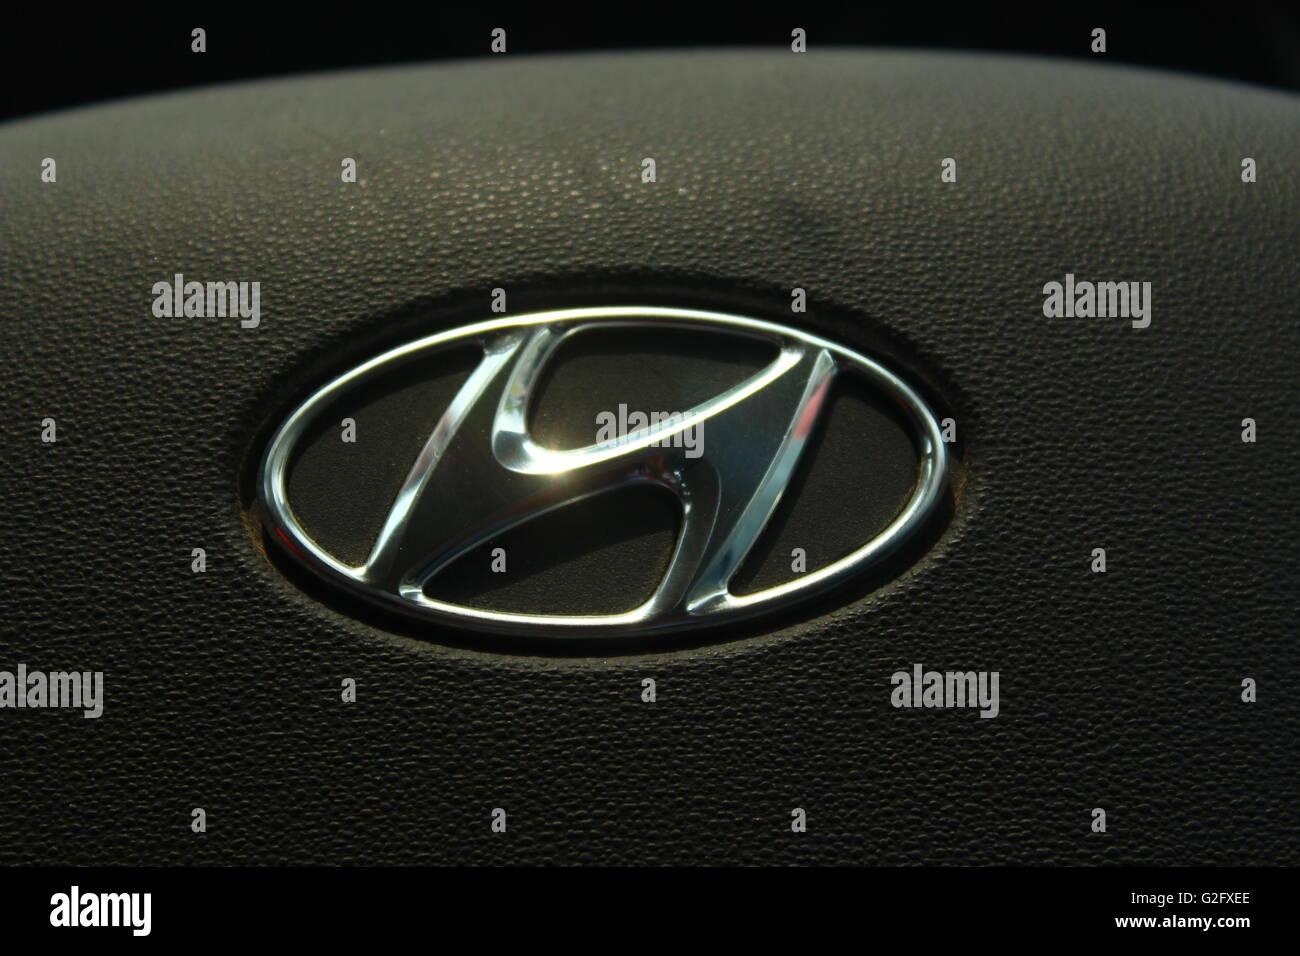 South Korean multinational  automotive manufacturer Hyundai motor company logo - Stock Image